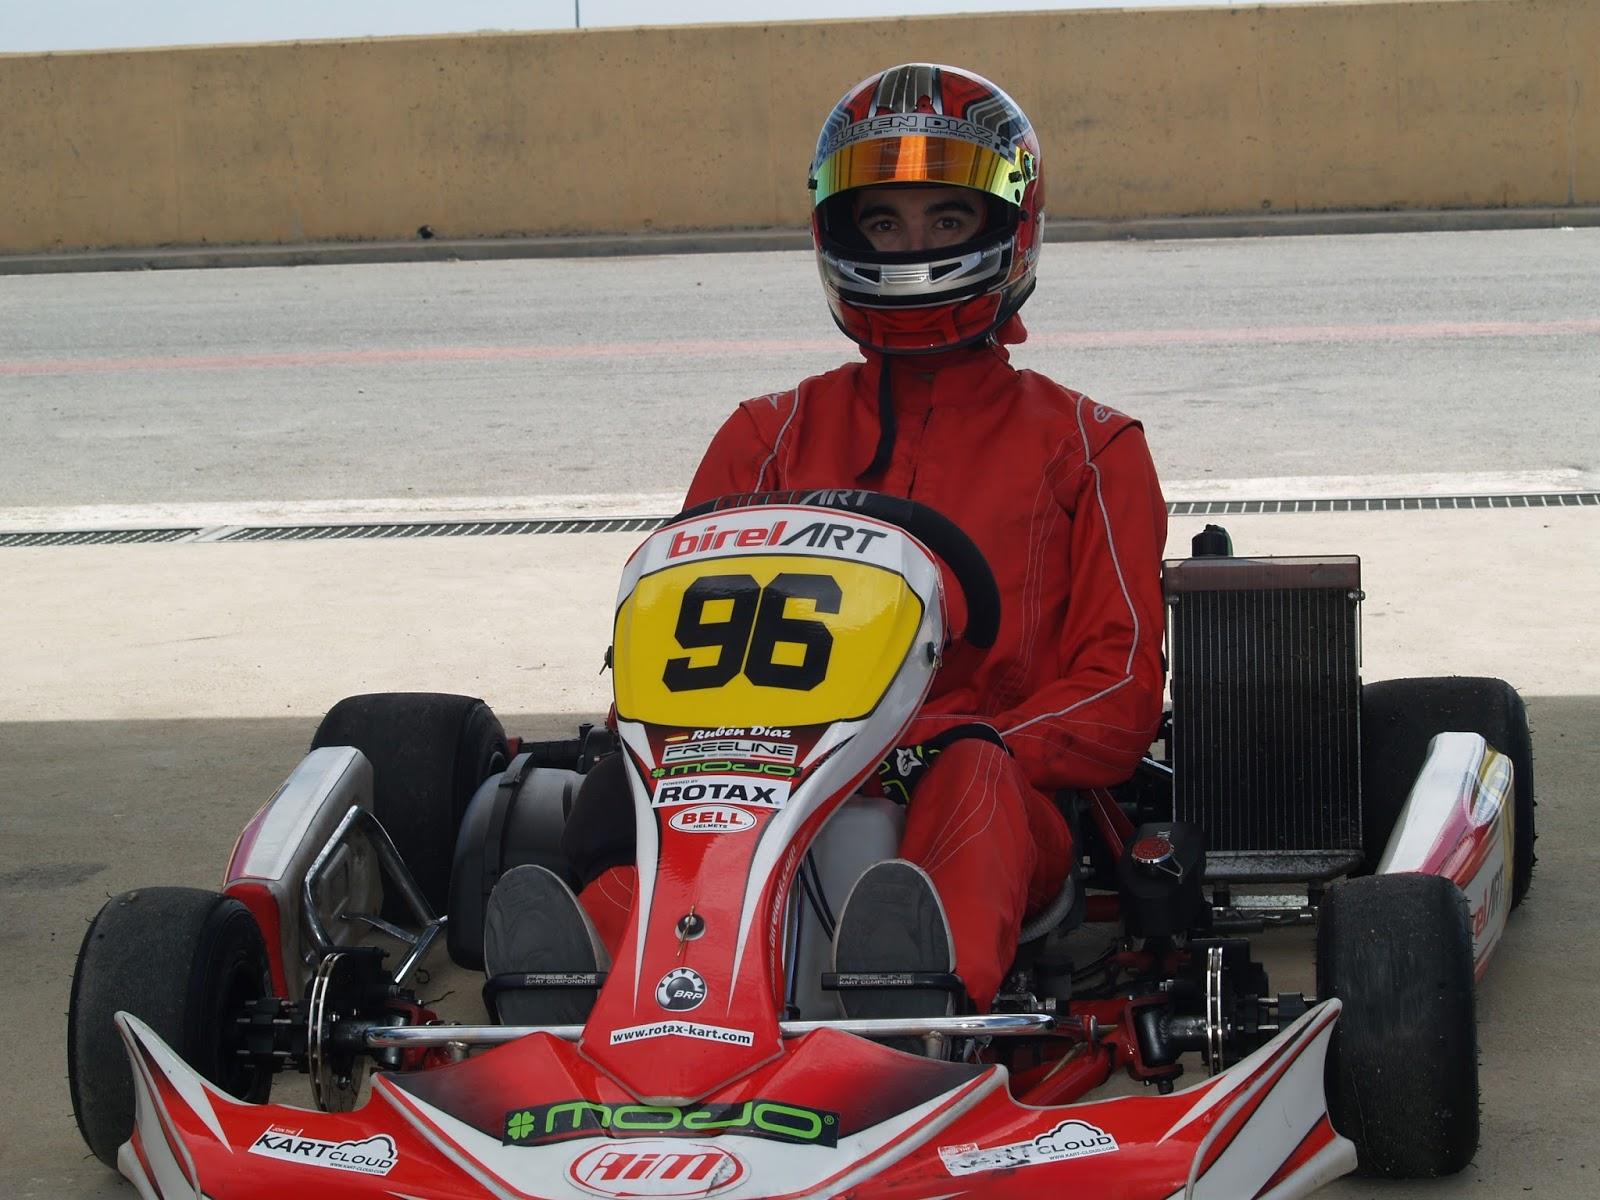 Circuito Fk1 : Nebukart racing team: primera prueba en el circuito internacional fk1